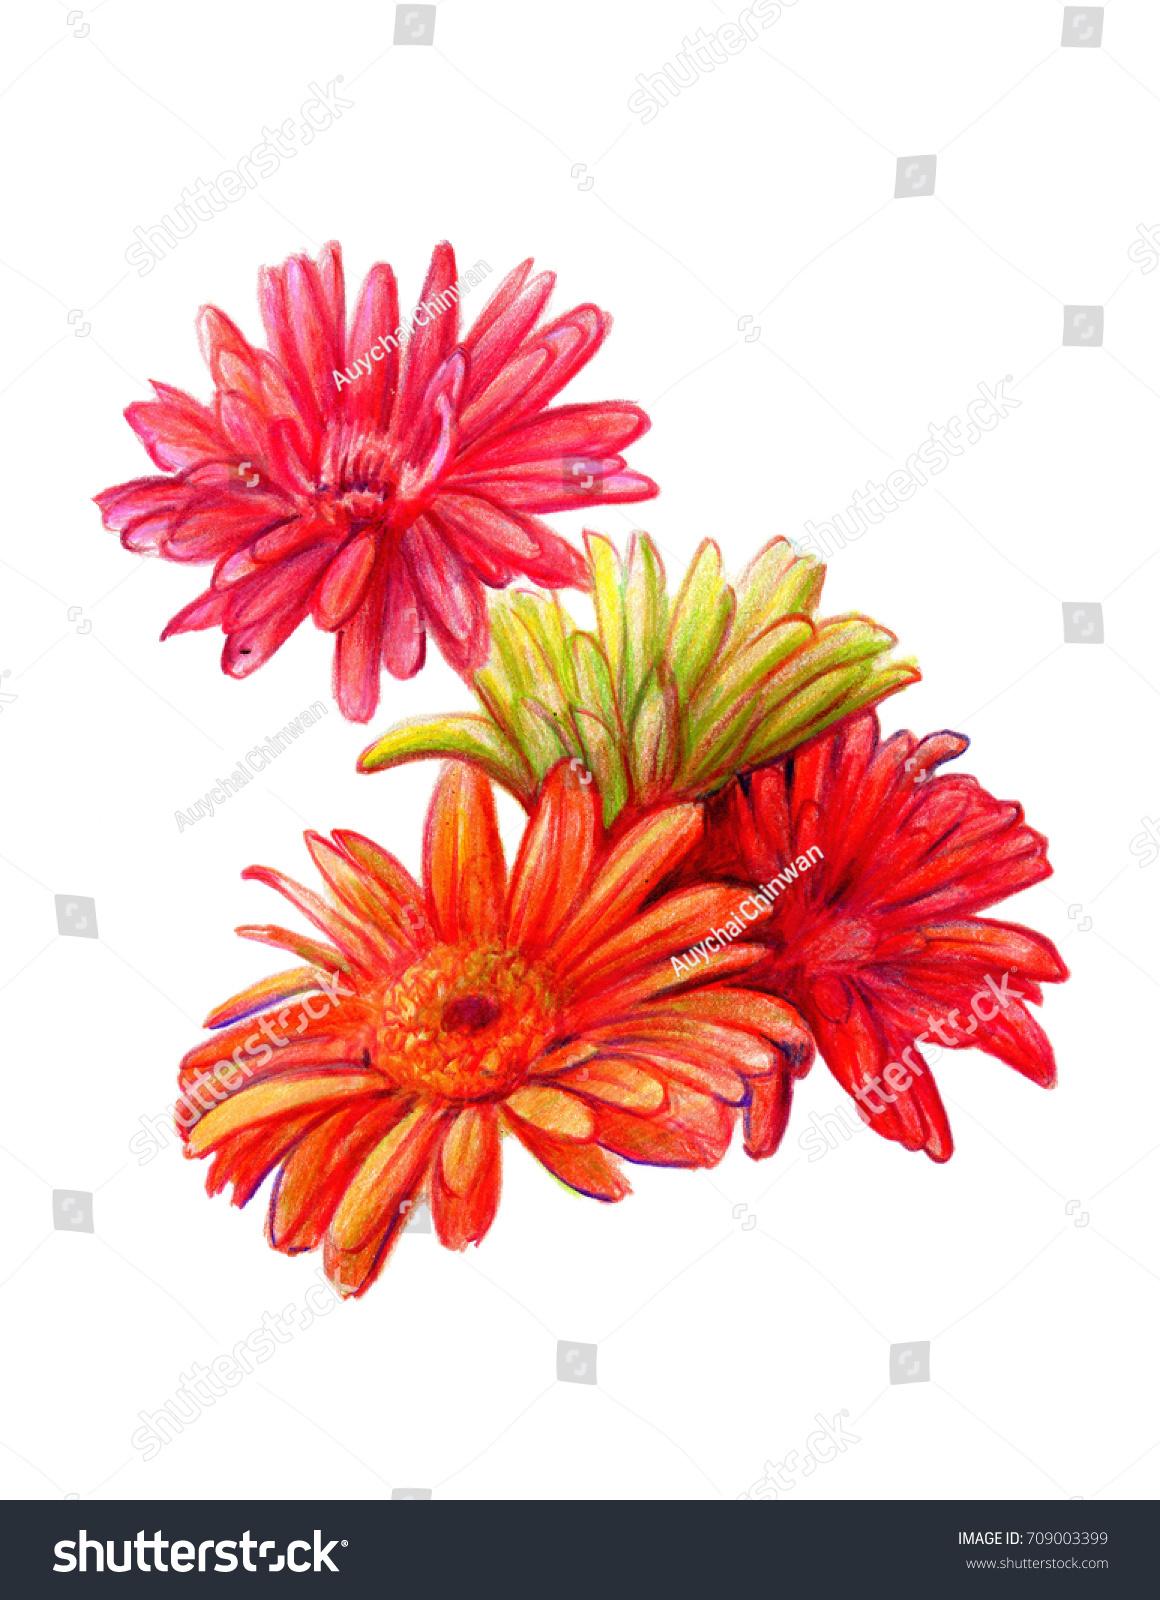 Still Life Colorful Gerbera Flowers Illustration Stock Illustration ...